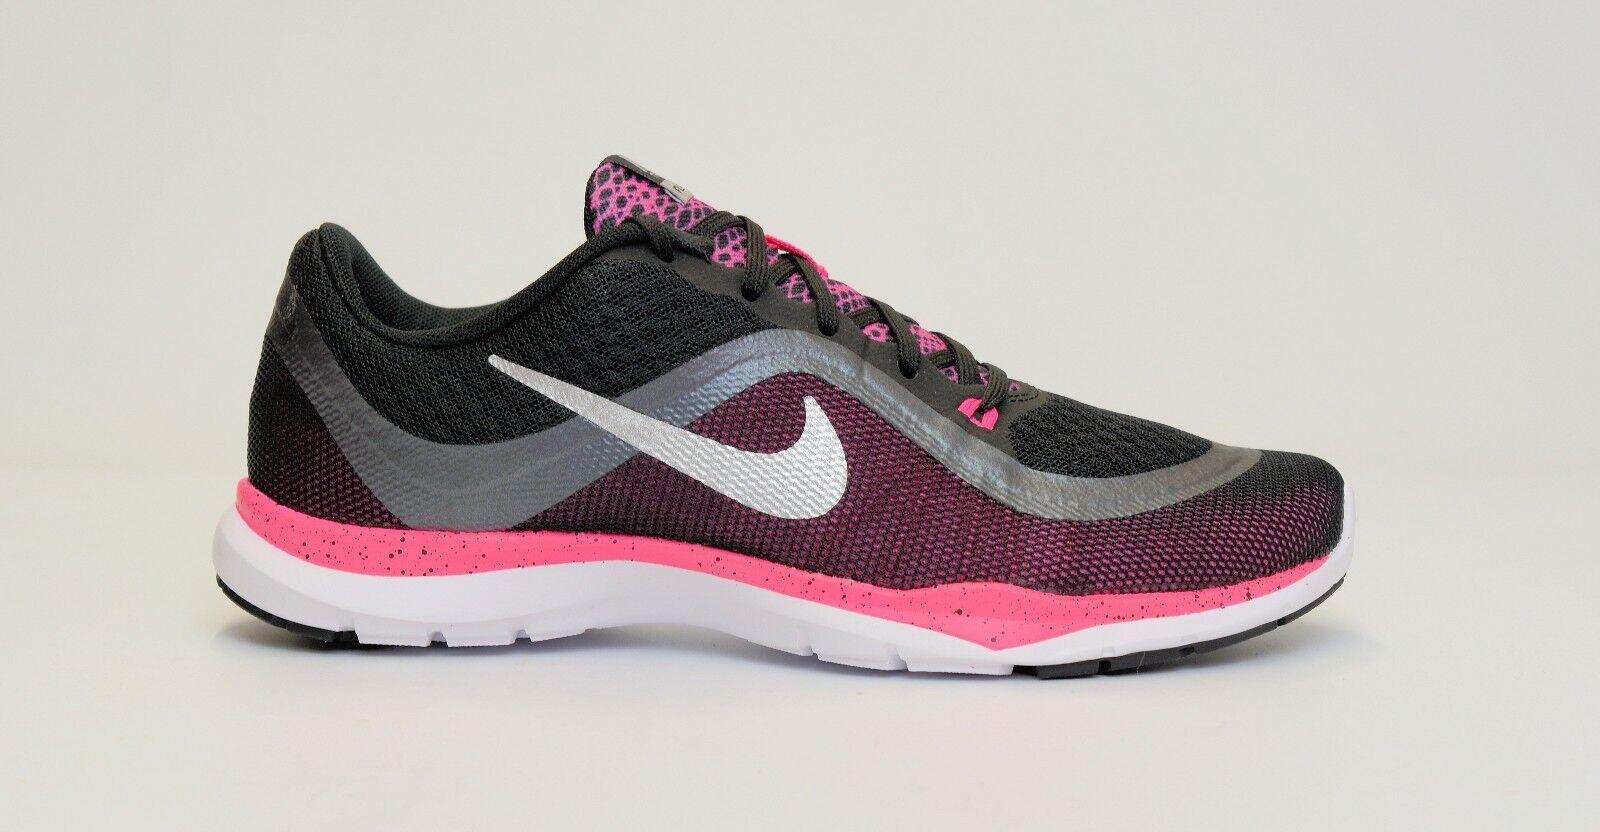 cheaper ebabc 3d817 ... Women`s Nike Flex Trainer 6 BTS 831577 831577 831577 004 0e43fc ...